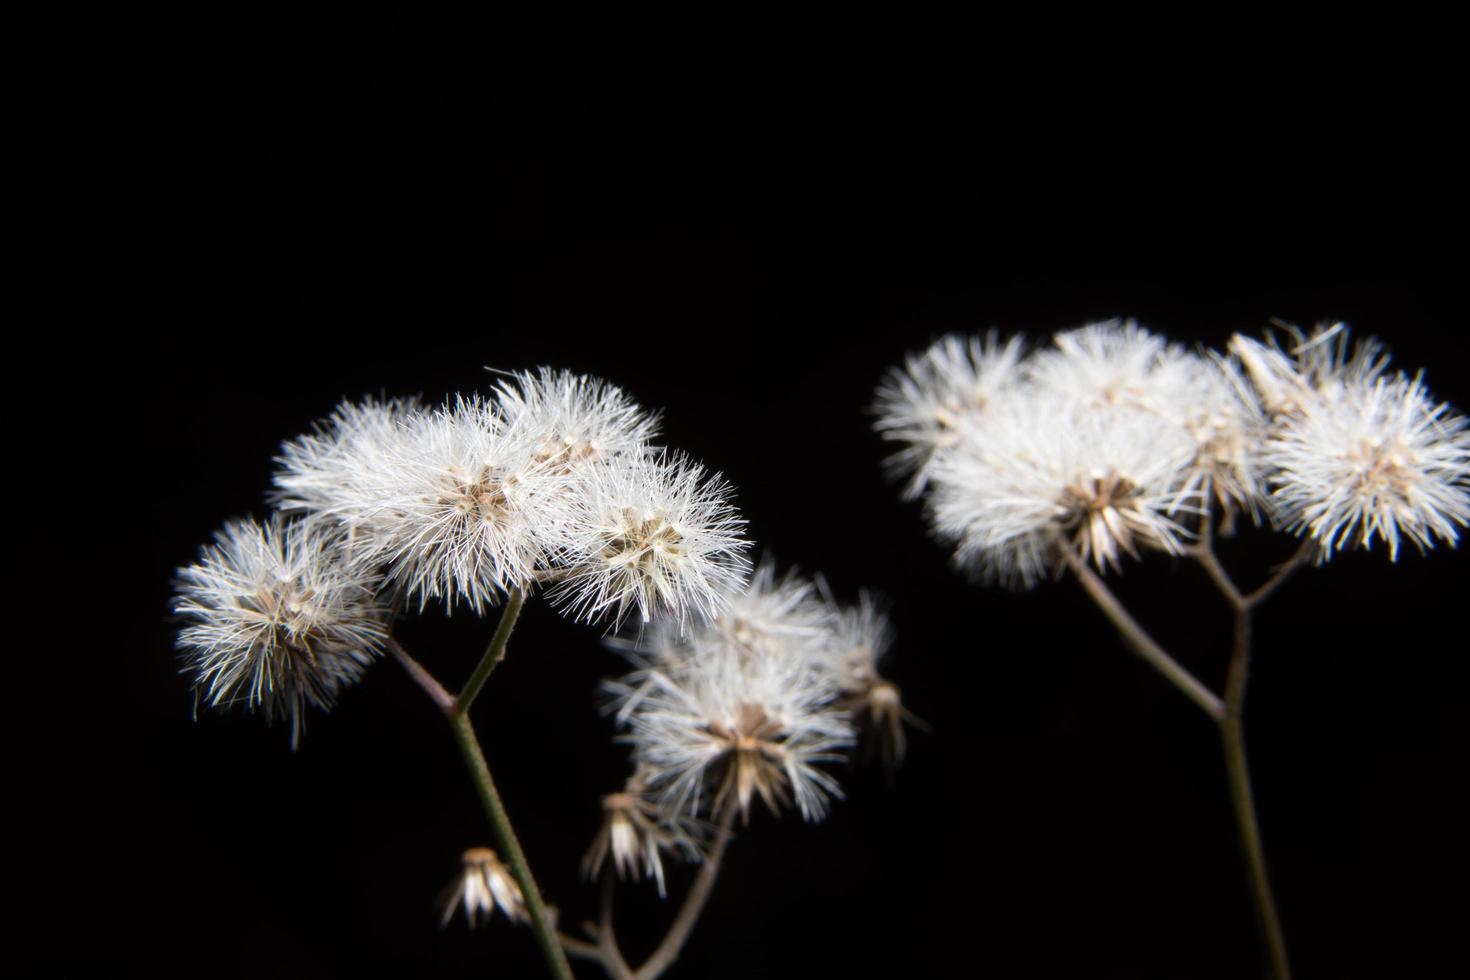 gras bloem close-up foto